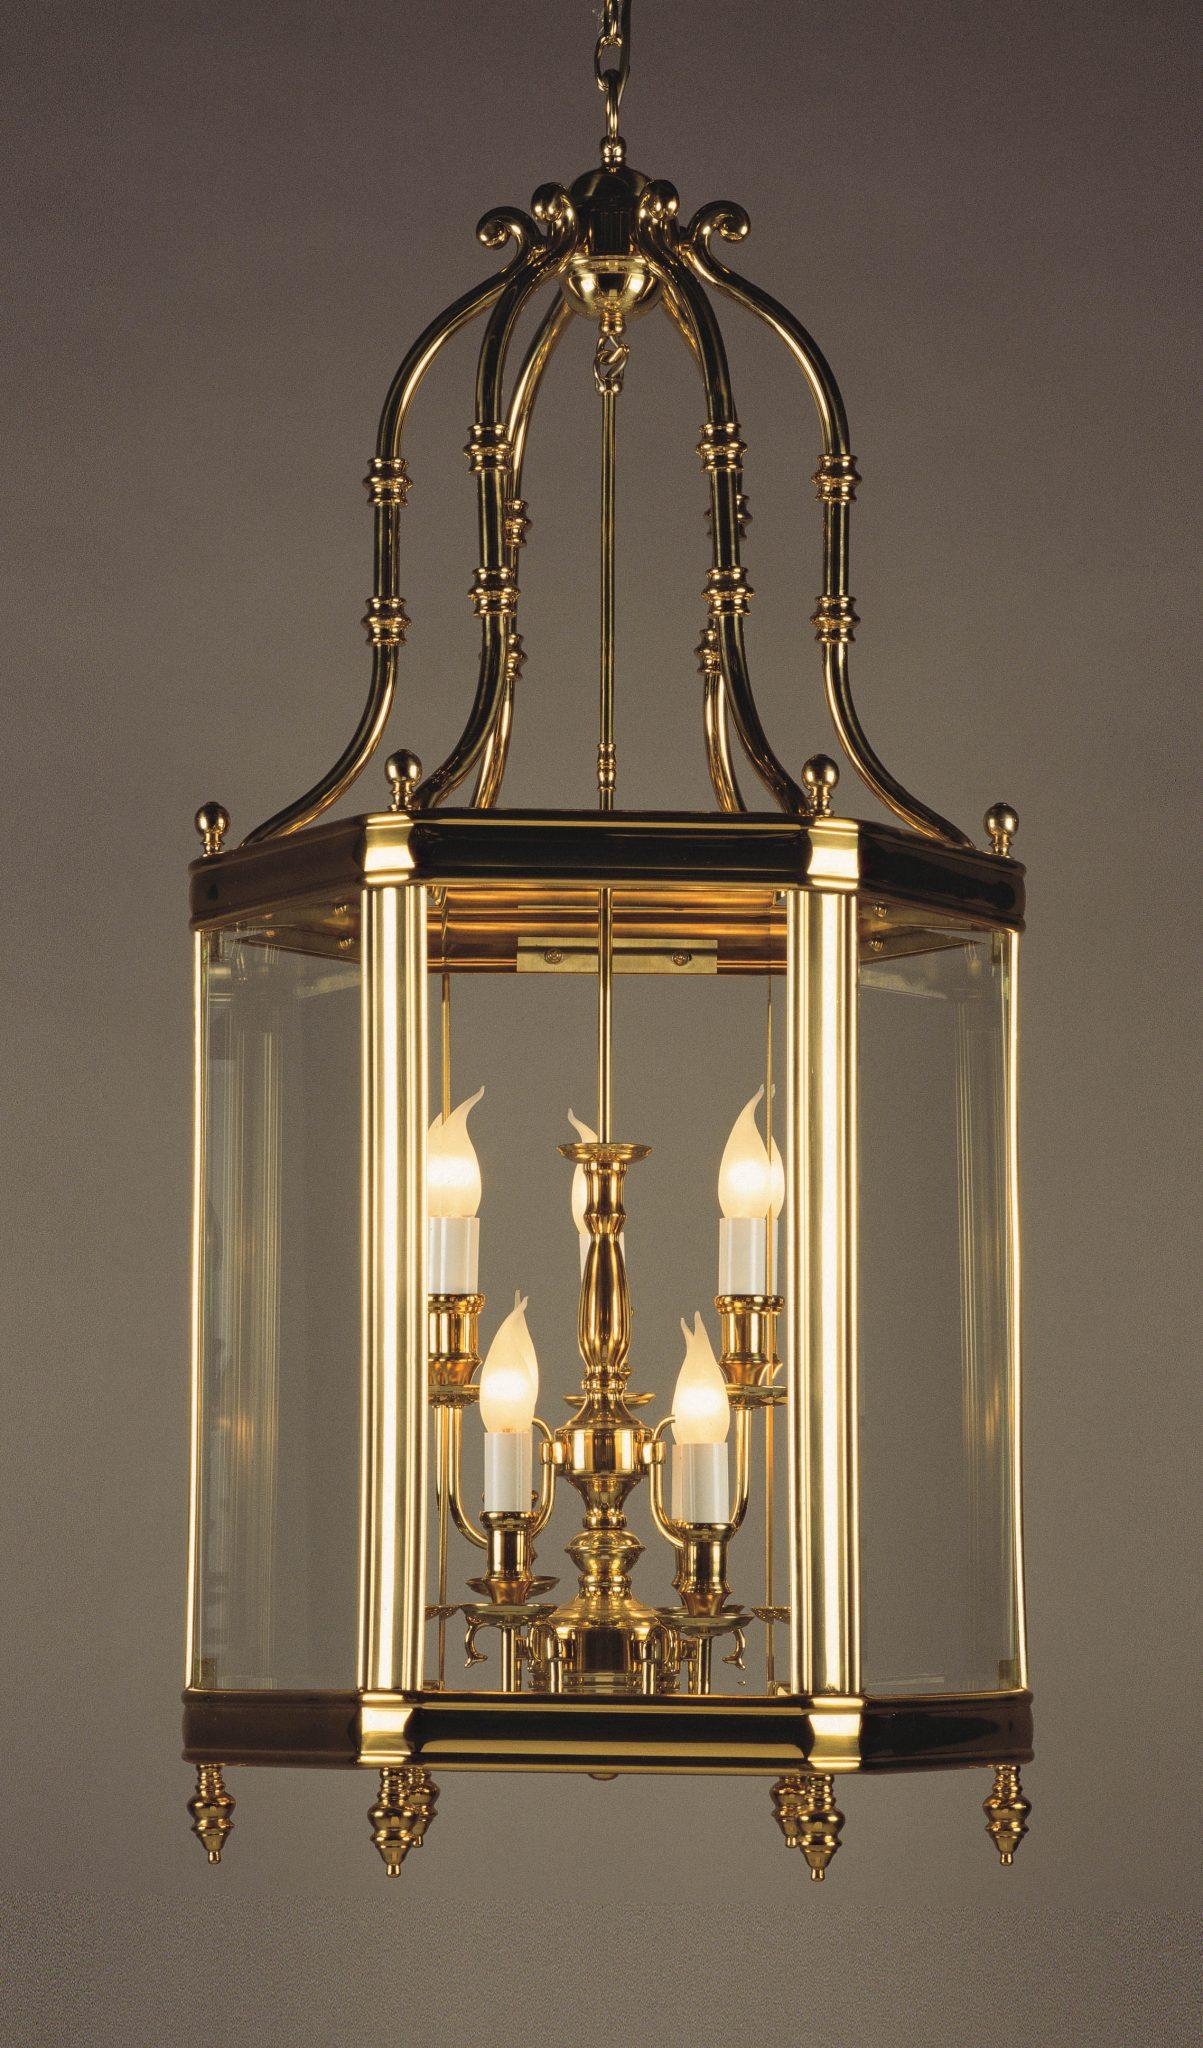 Impex LG00024/09/PB Regal 9 light Lantern, Polished Brass